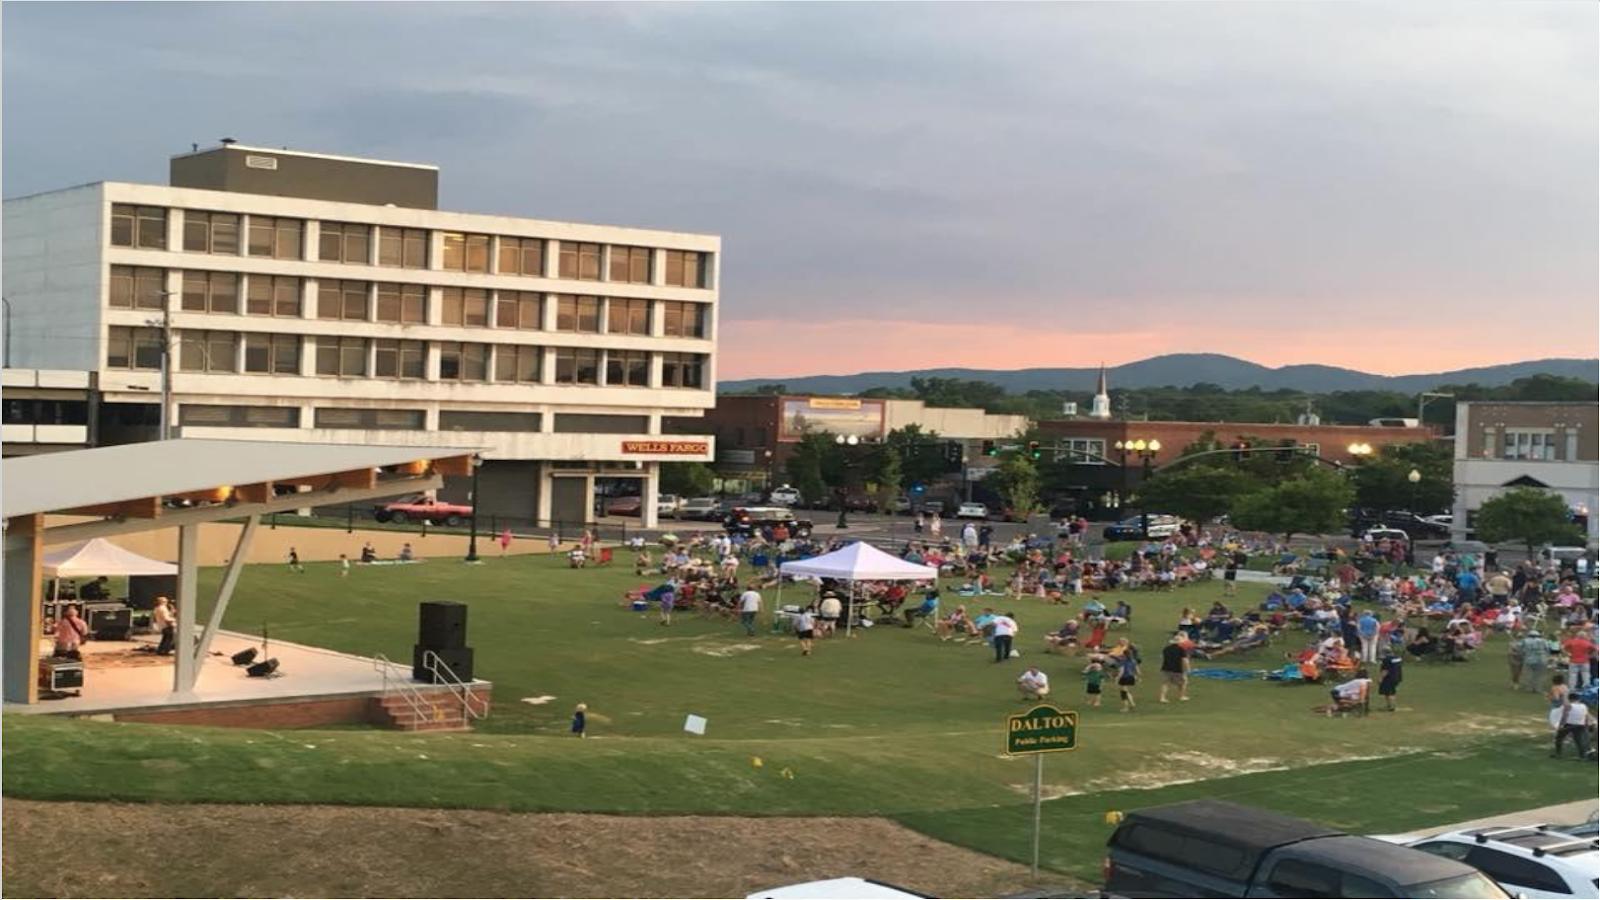 The new Burr Performing Arts Park, Downtown Dalton (2018)